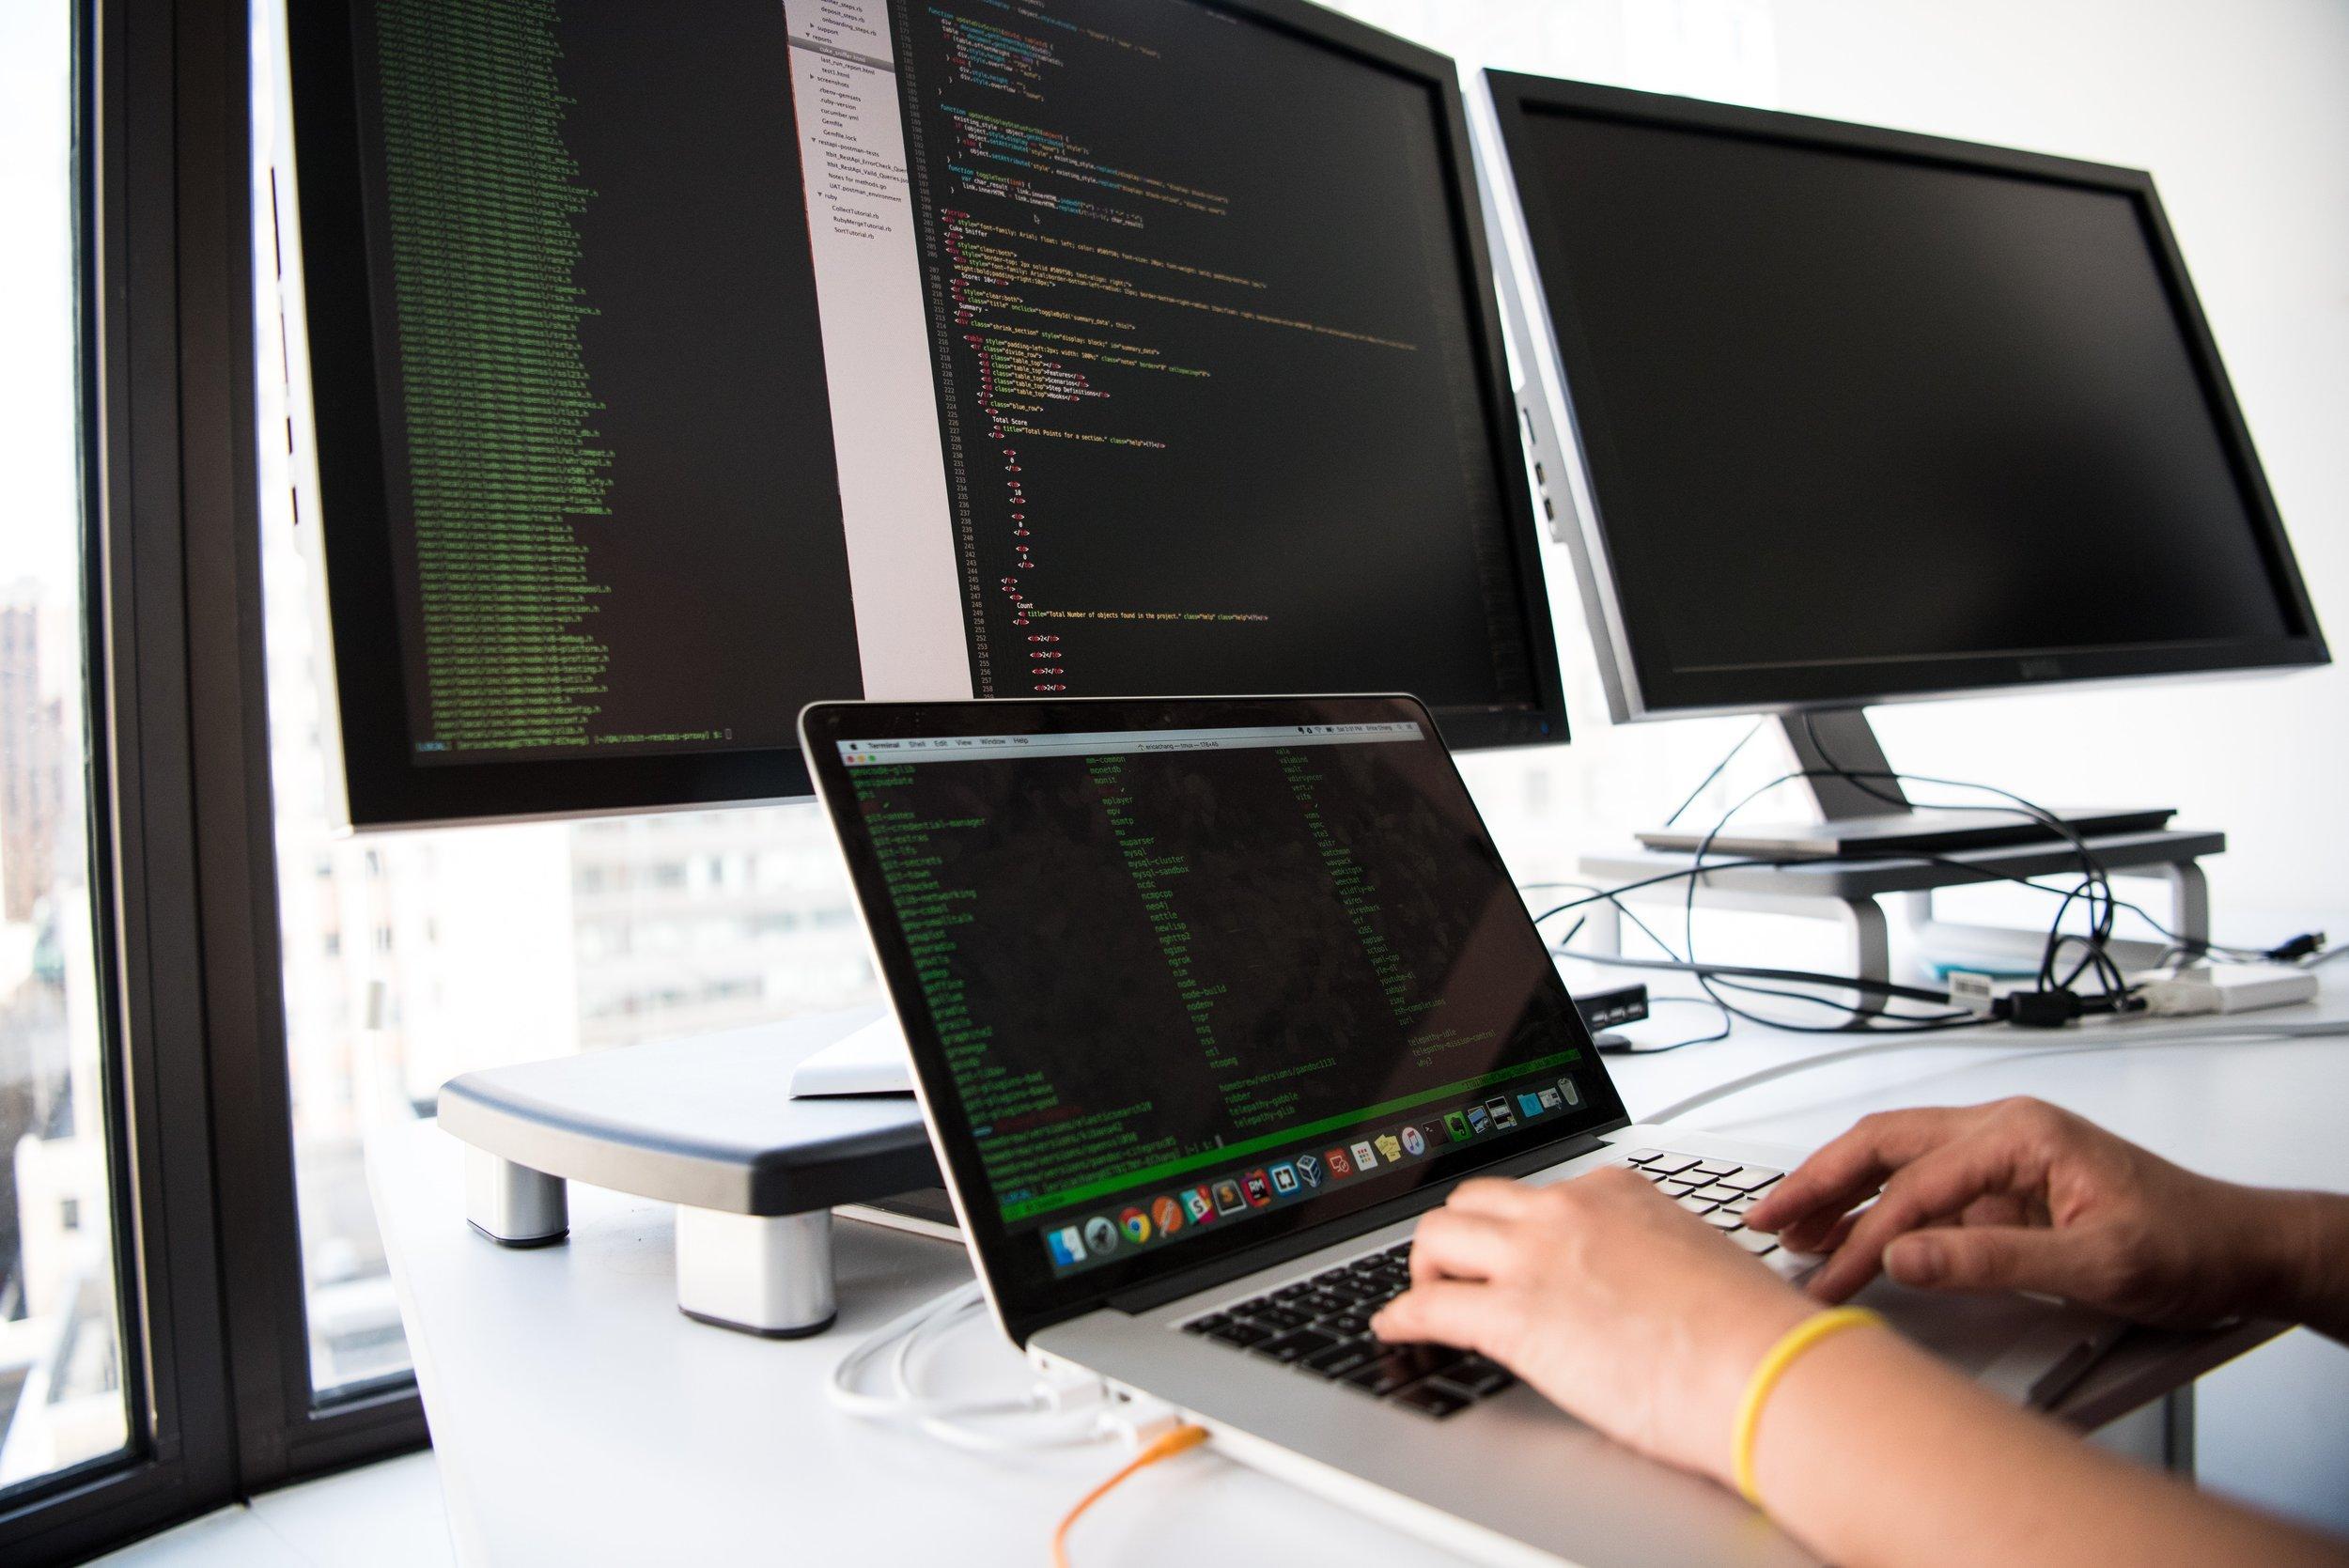 computer-connection-data-API-1181675.jpg